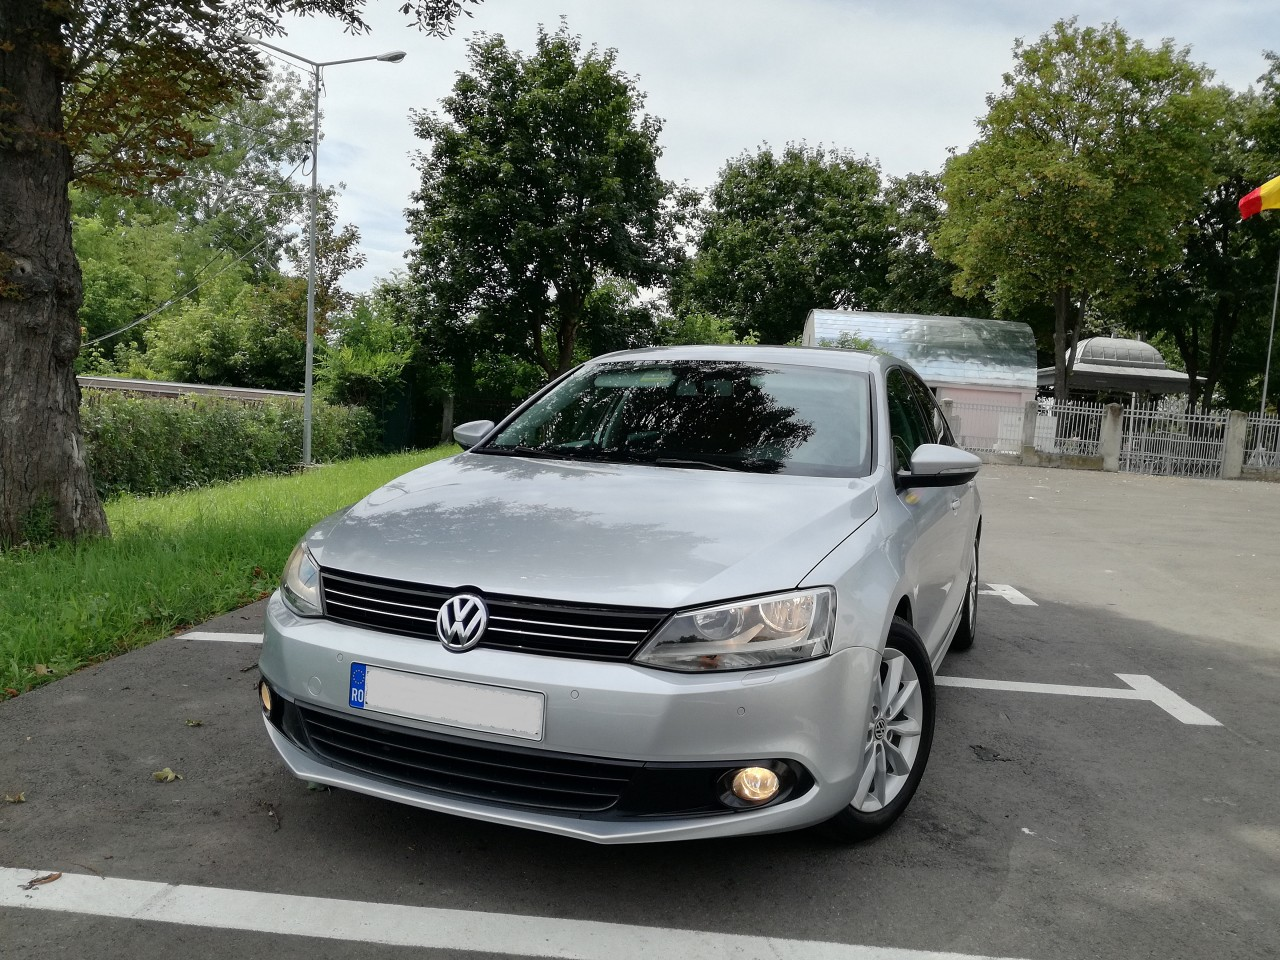 VW Jetta 2012= EURO 5 2012